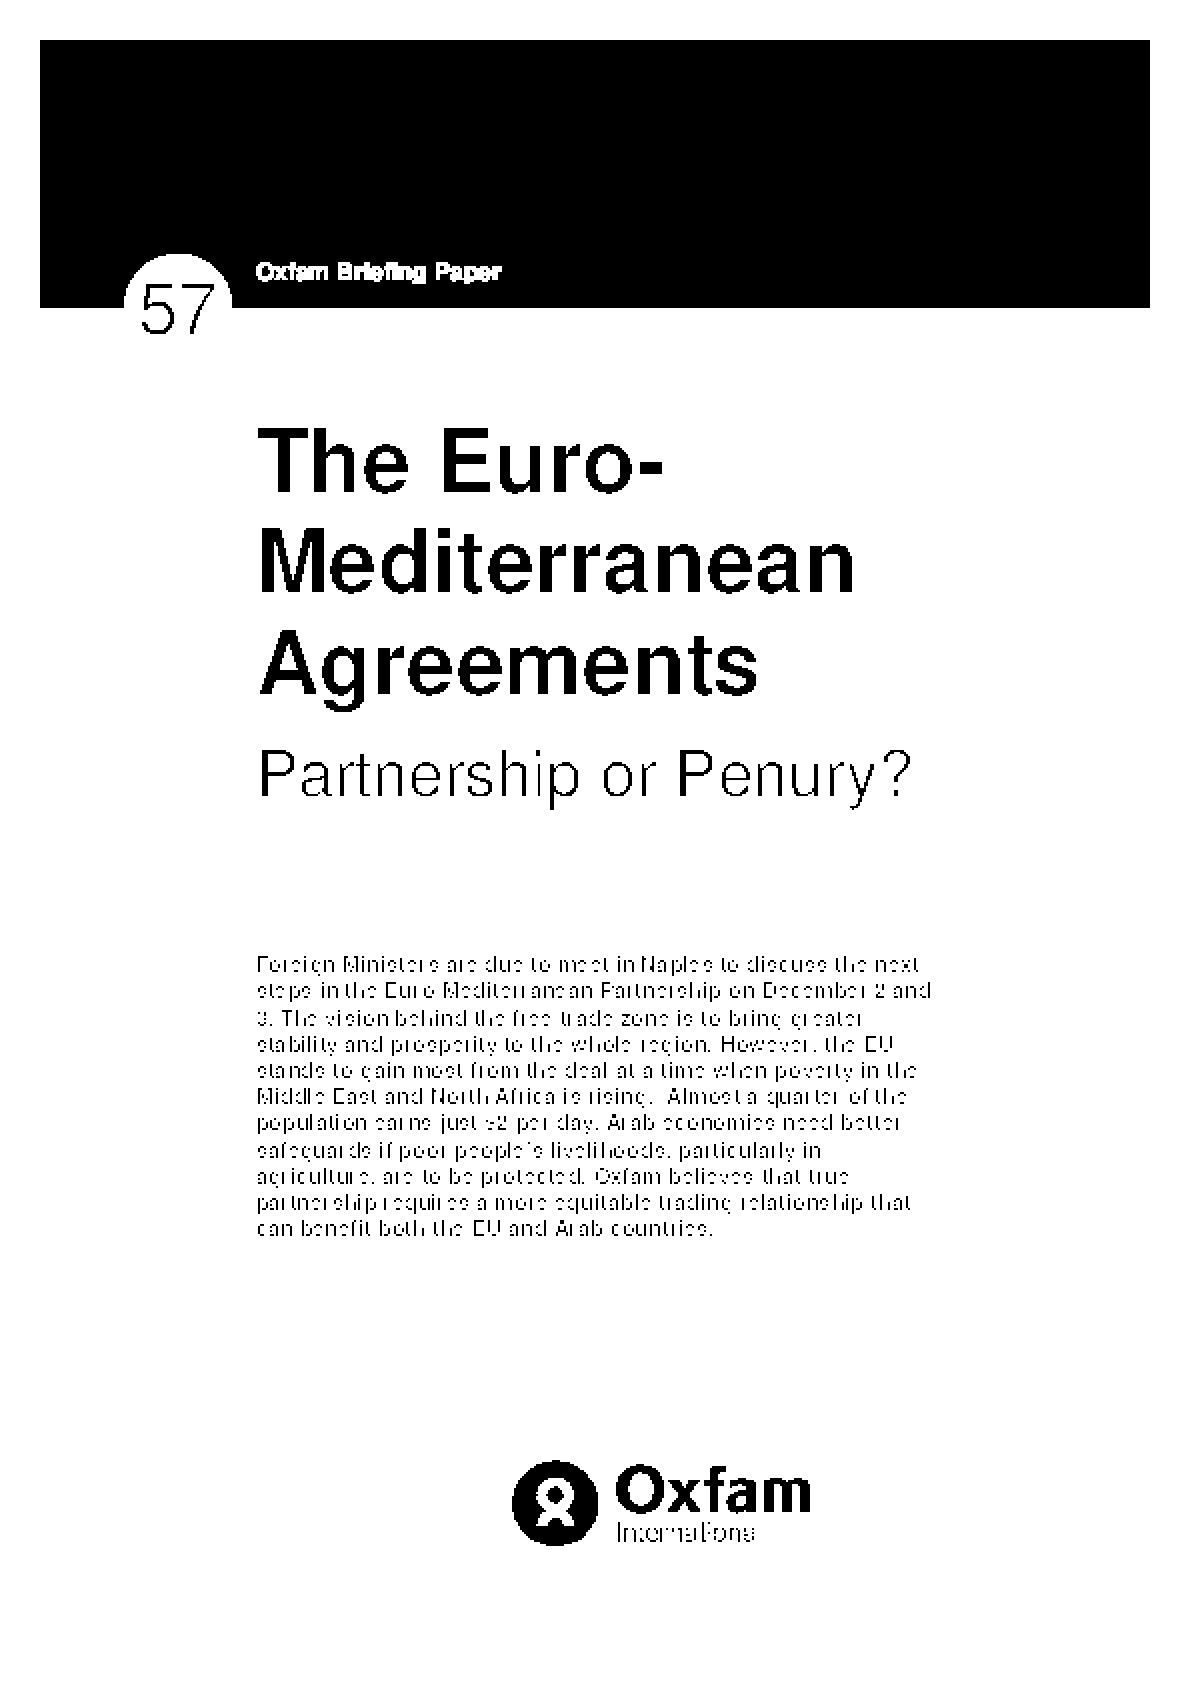 The Euro-Mediterranean Agreements: Partnership or Penury?